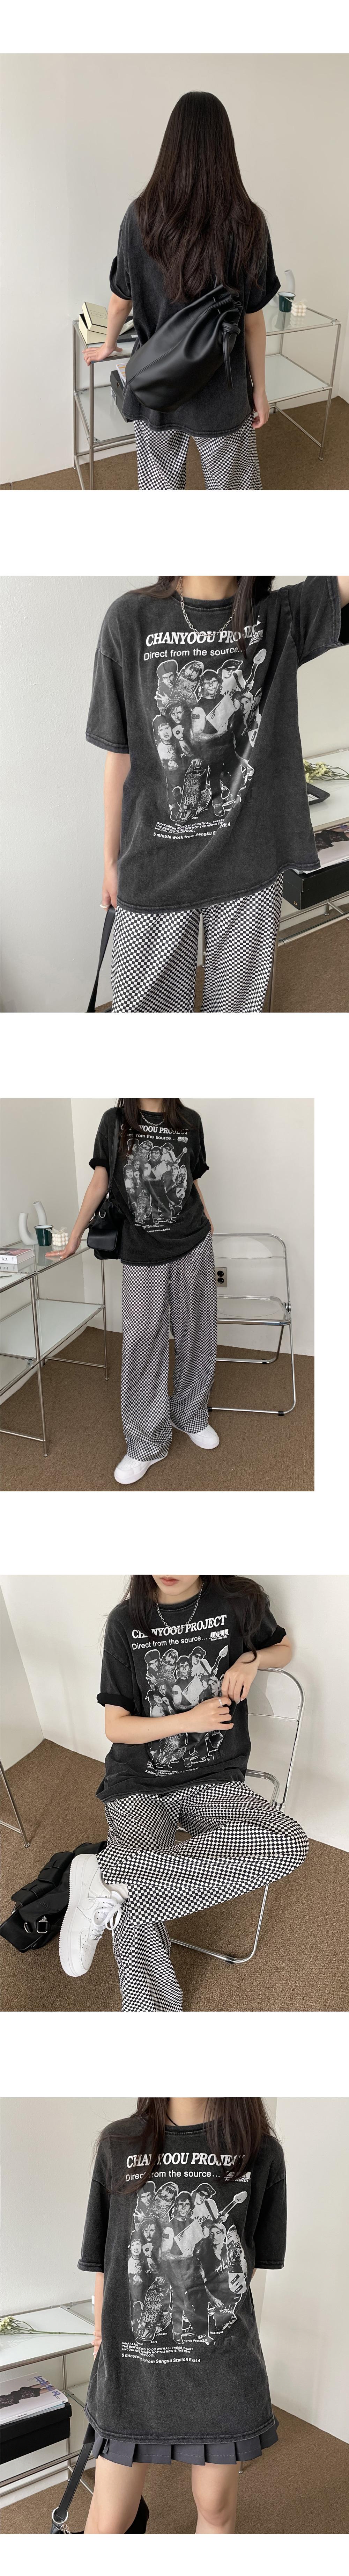 Chanyu Pigment Faded Print Short Sleeve T-shirt